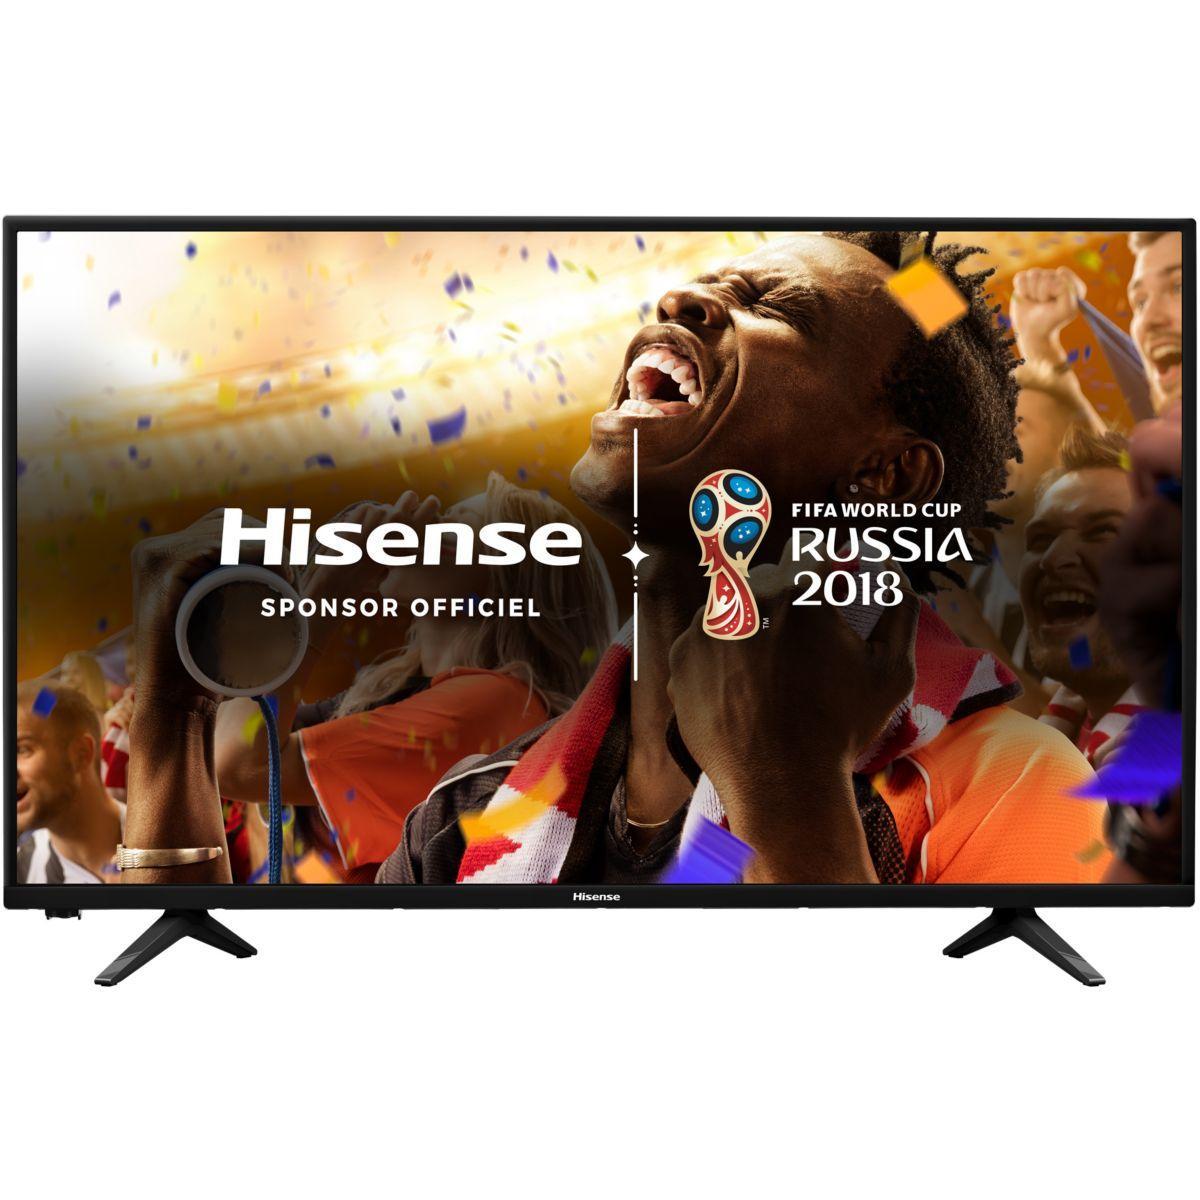 Tv led hisense h39a5100 (photo)